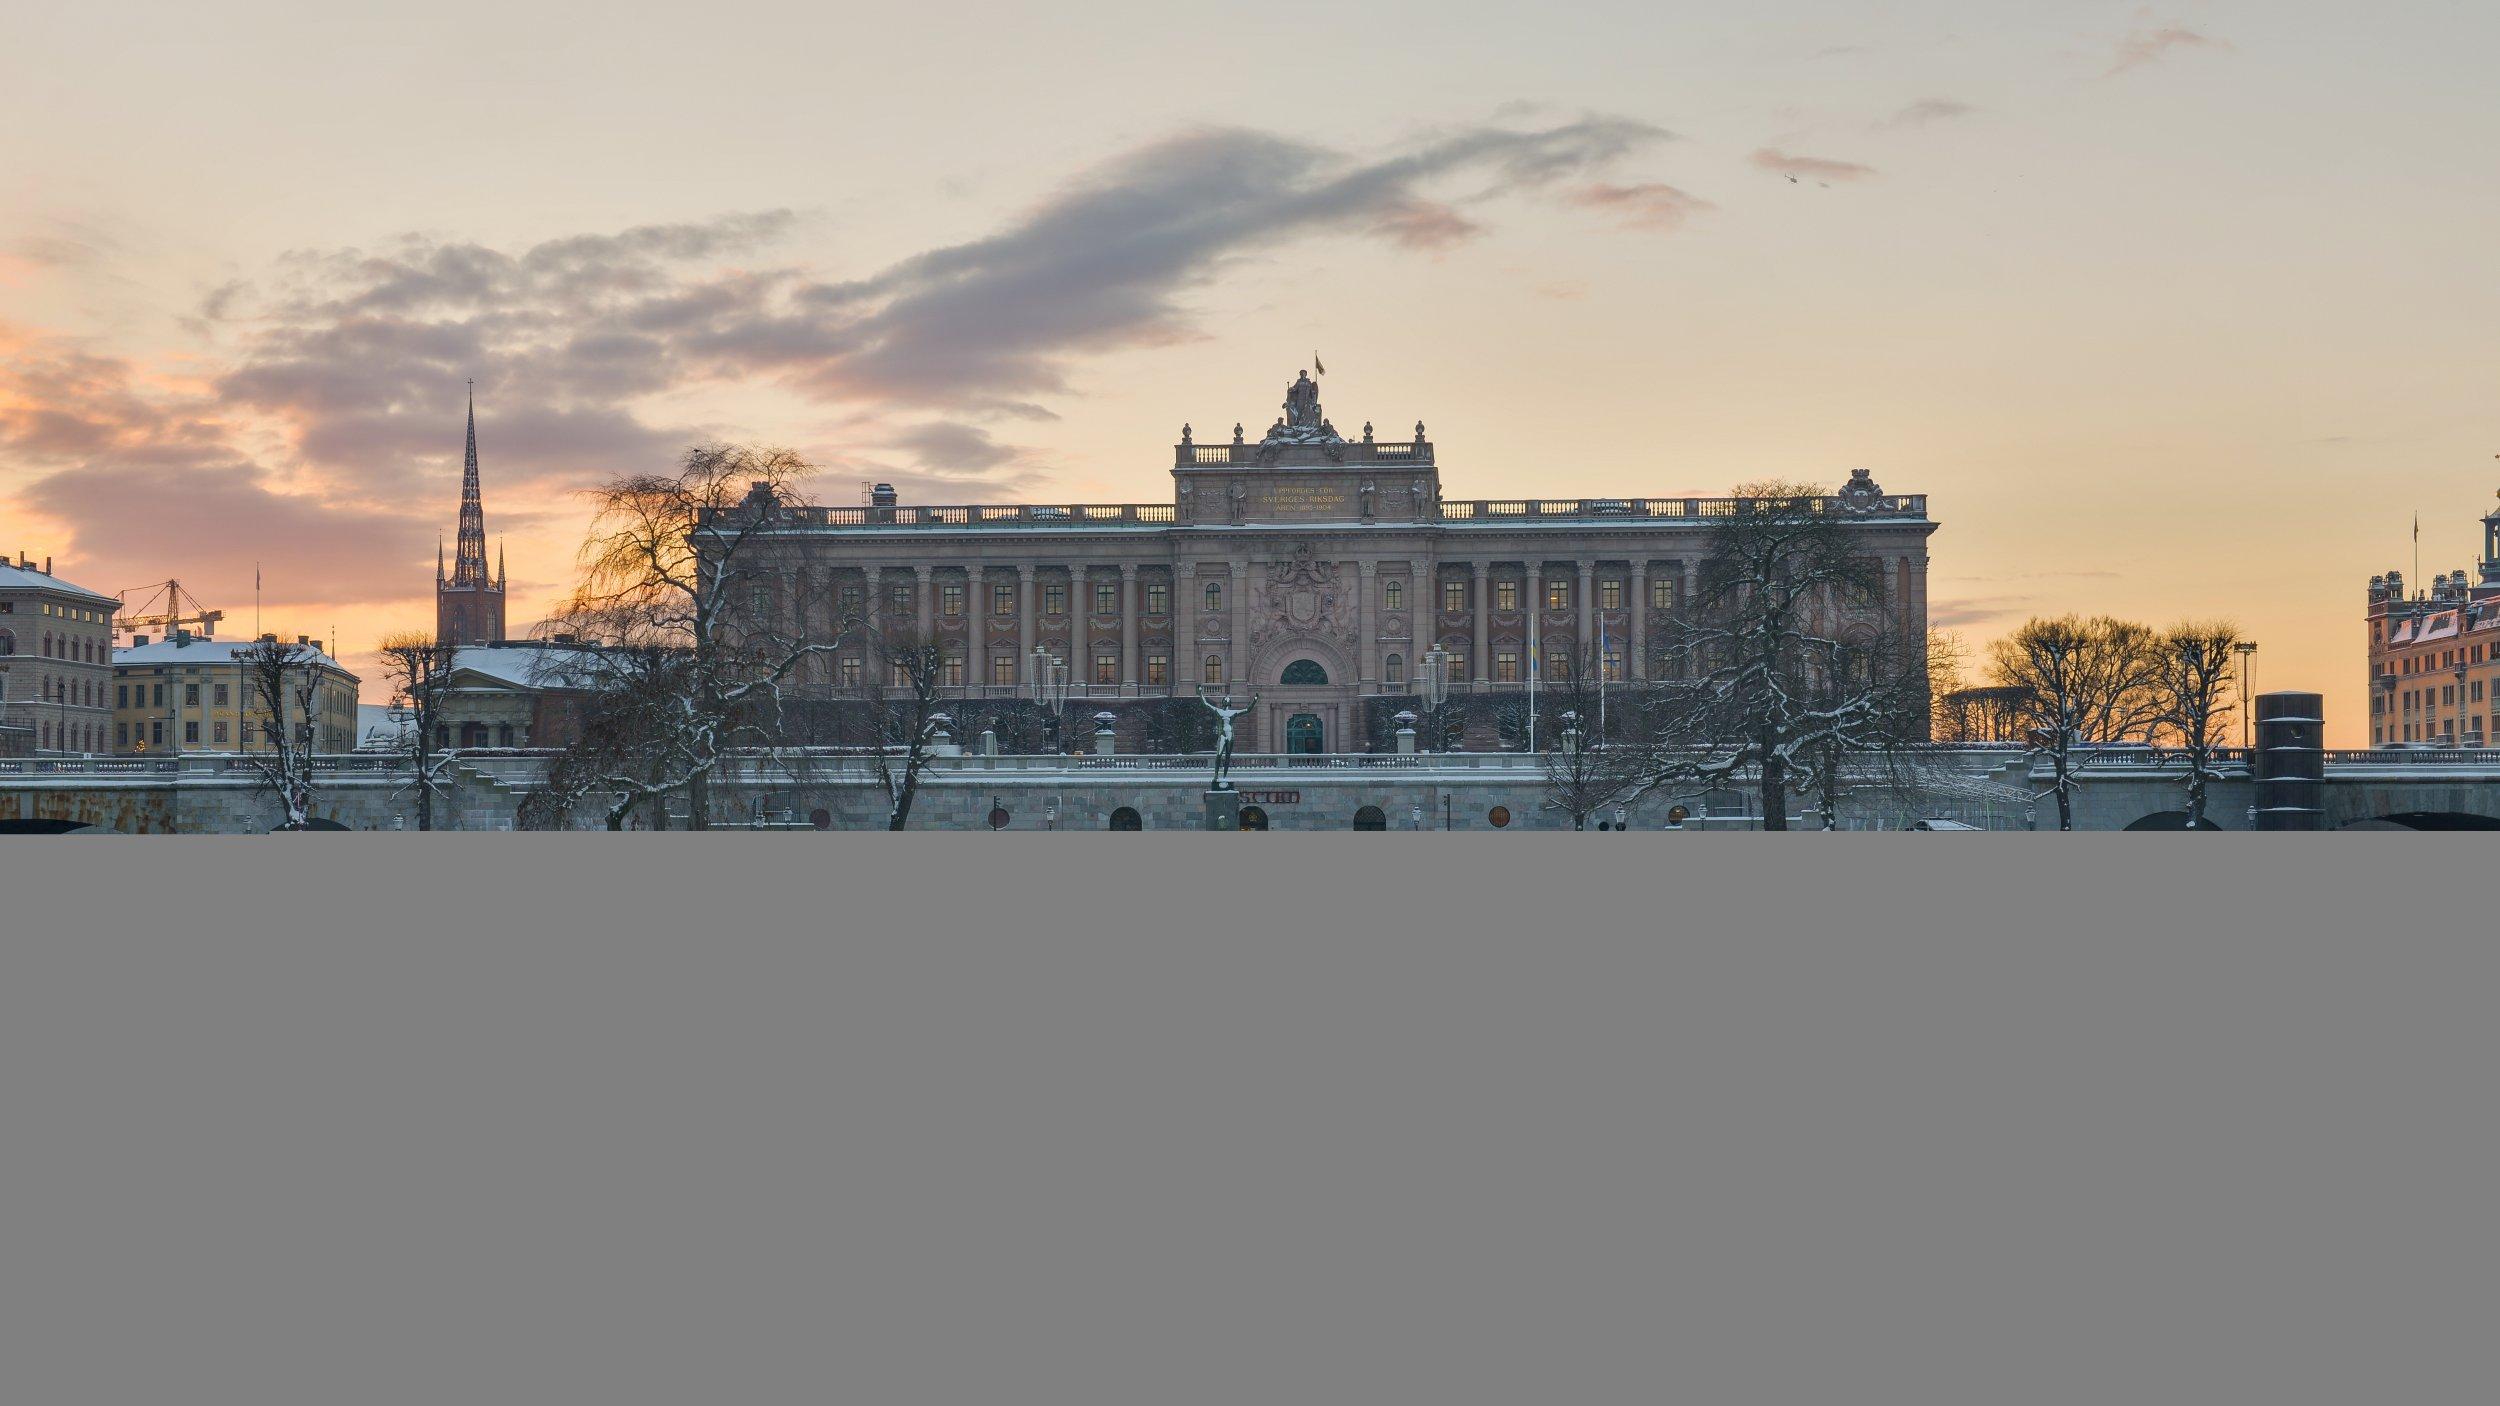 Swedish parliament Riksdagen